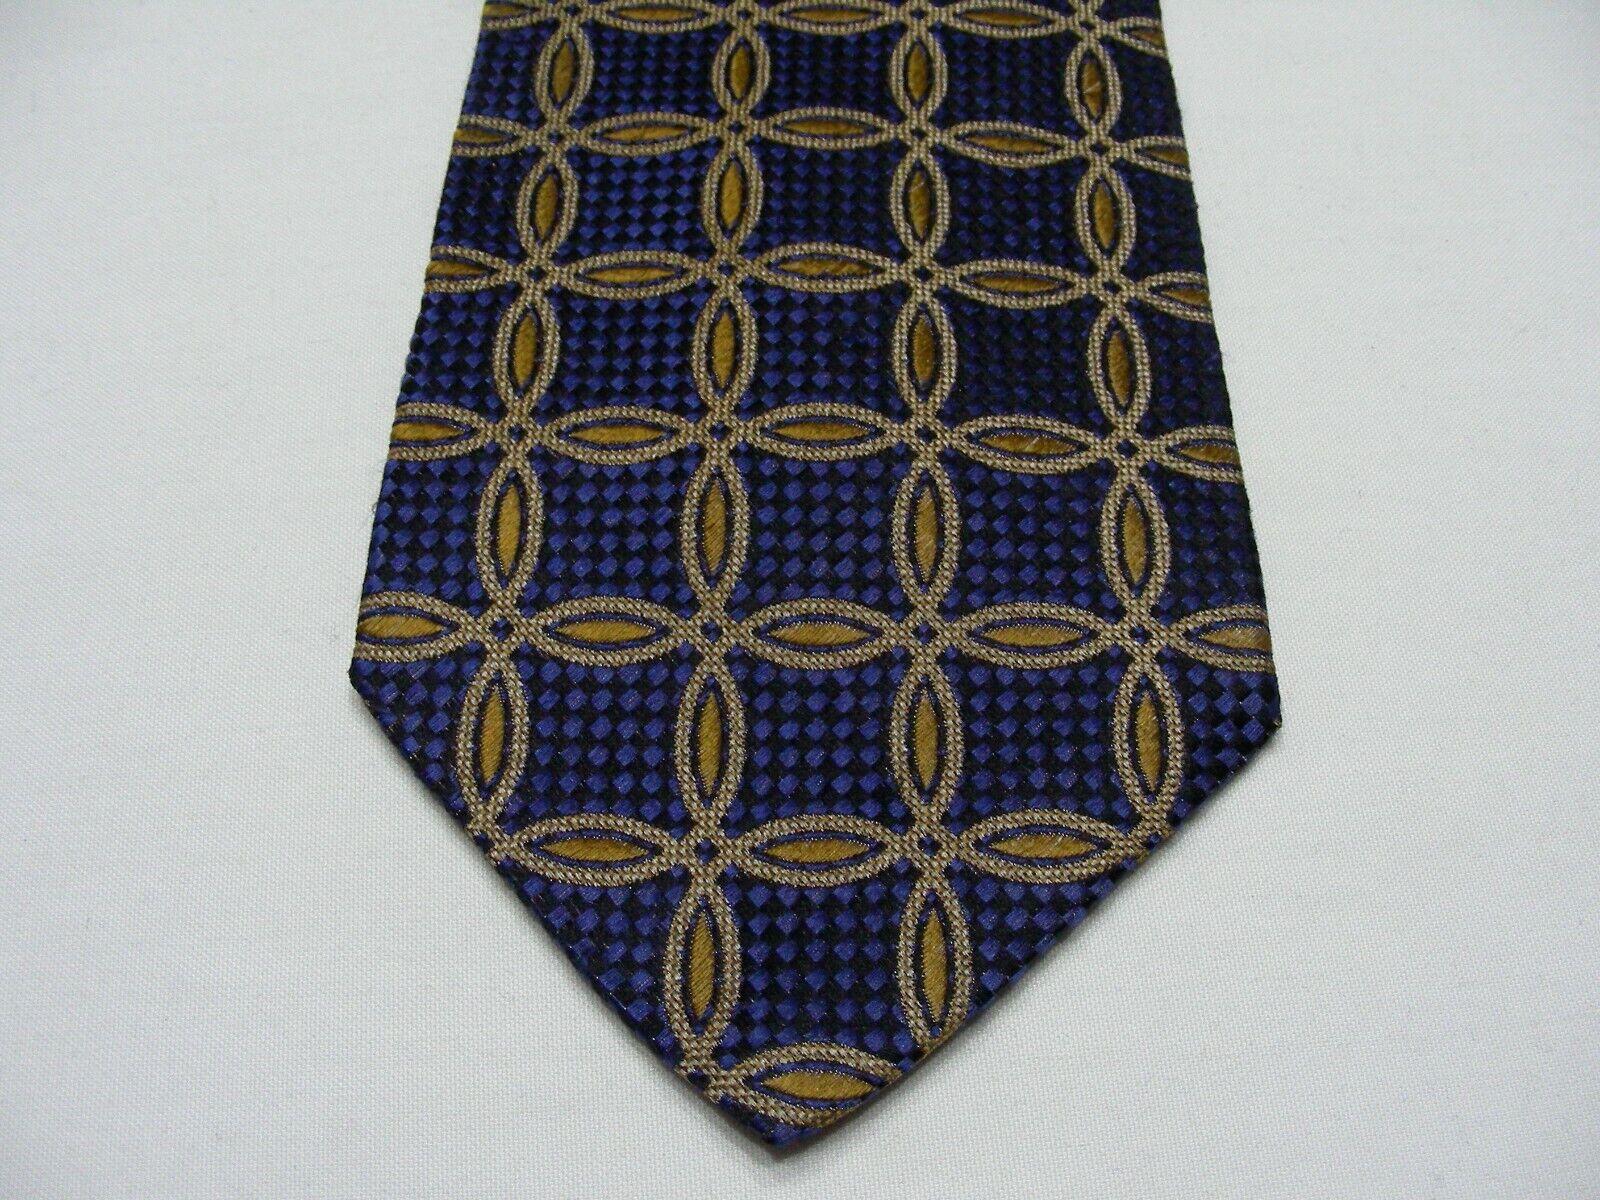 ALLEGRO - Made in Italy - Geometric -100% Silk Neck Tie!